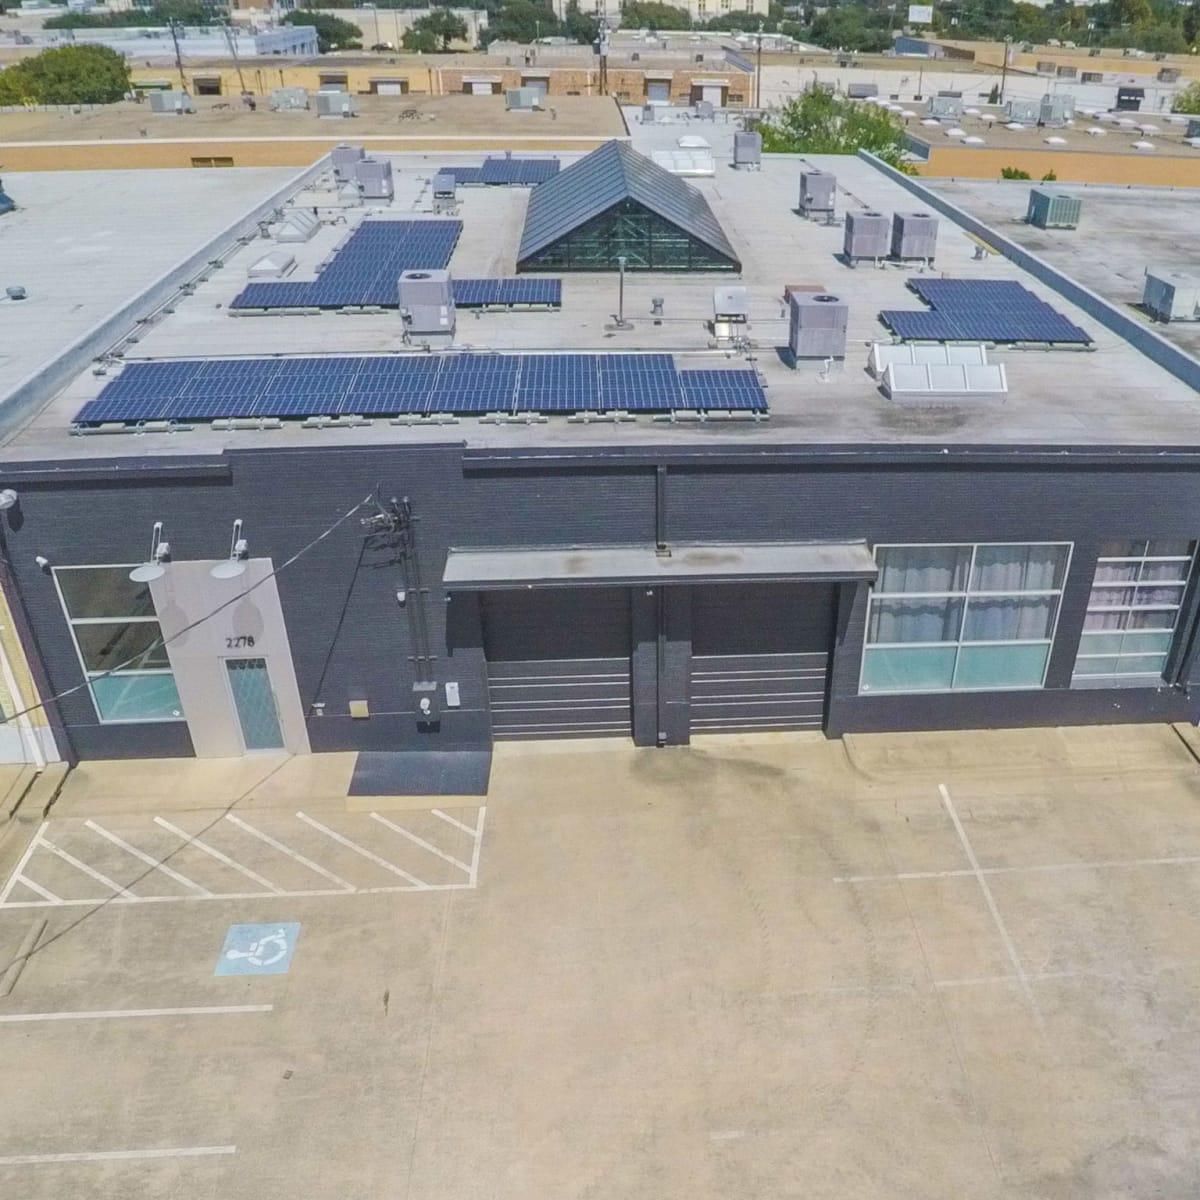 2278 Monitor Street, Dallas Design District warehouse, exterior